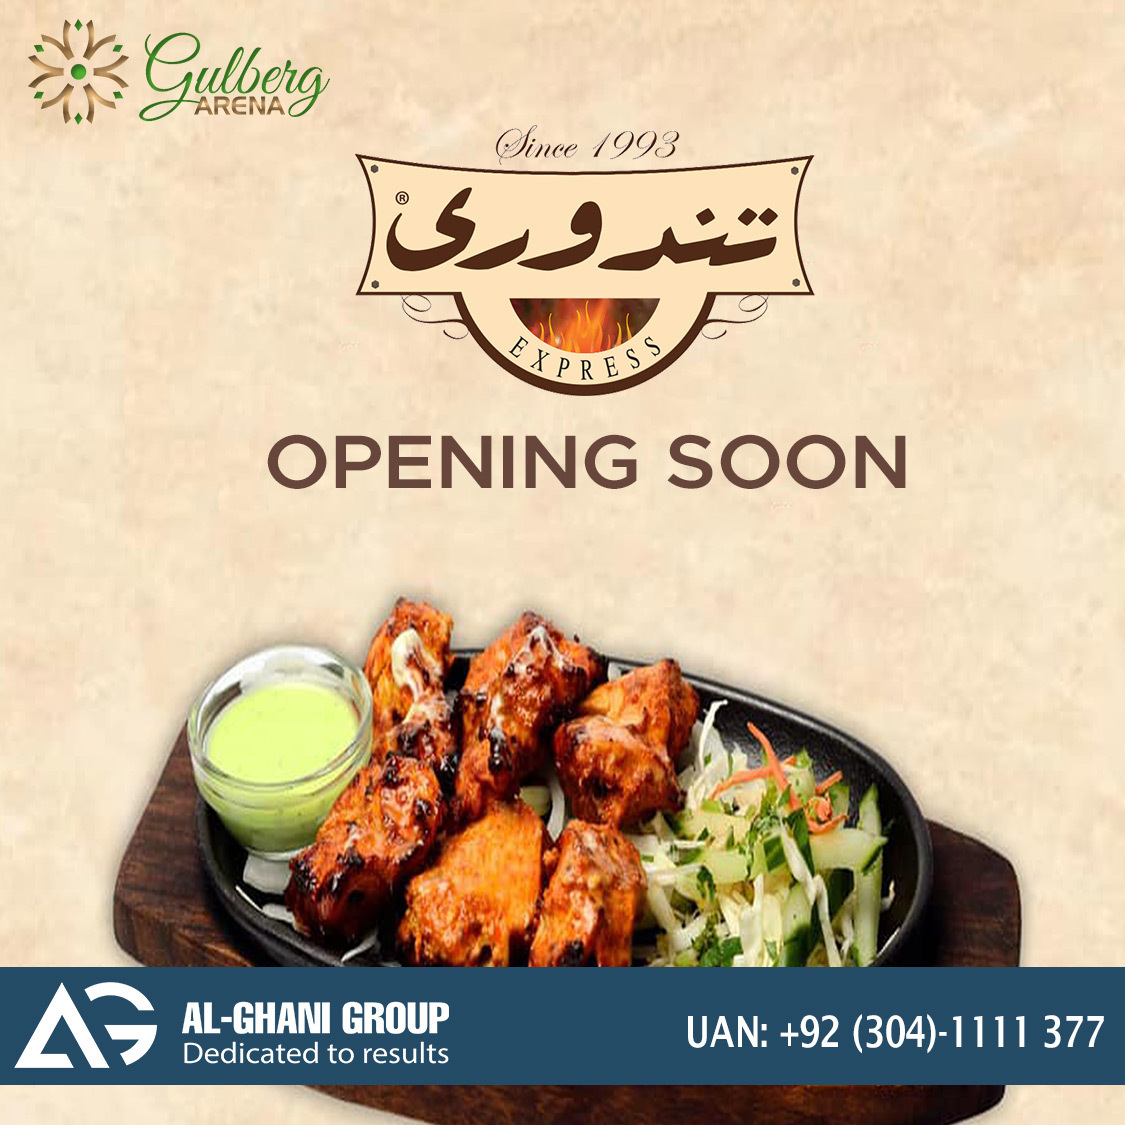 Tandoori Express outlet in food Court gulberg arena at Gulberg Greens Islamabad